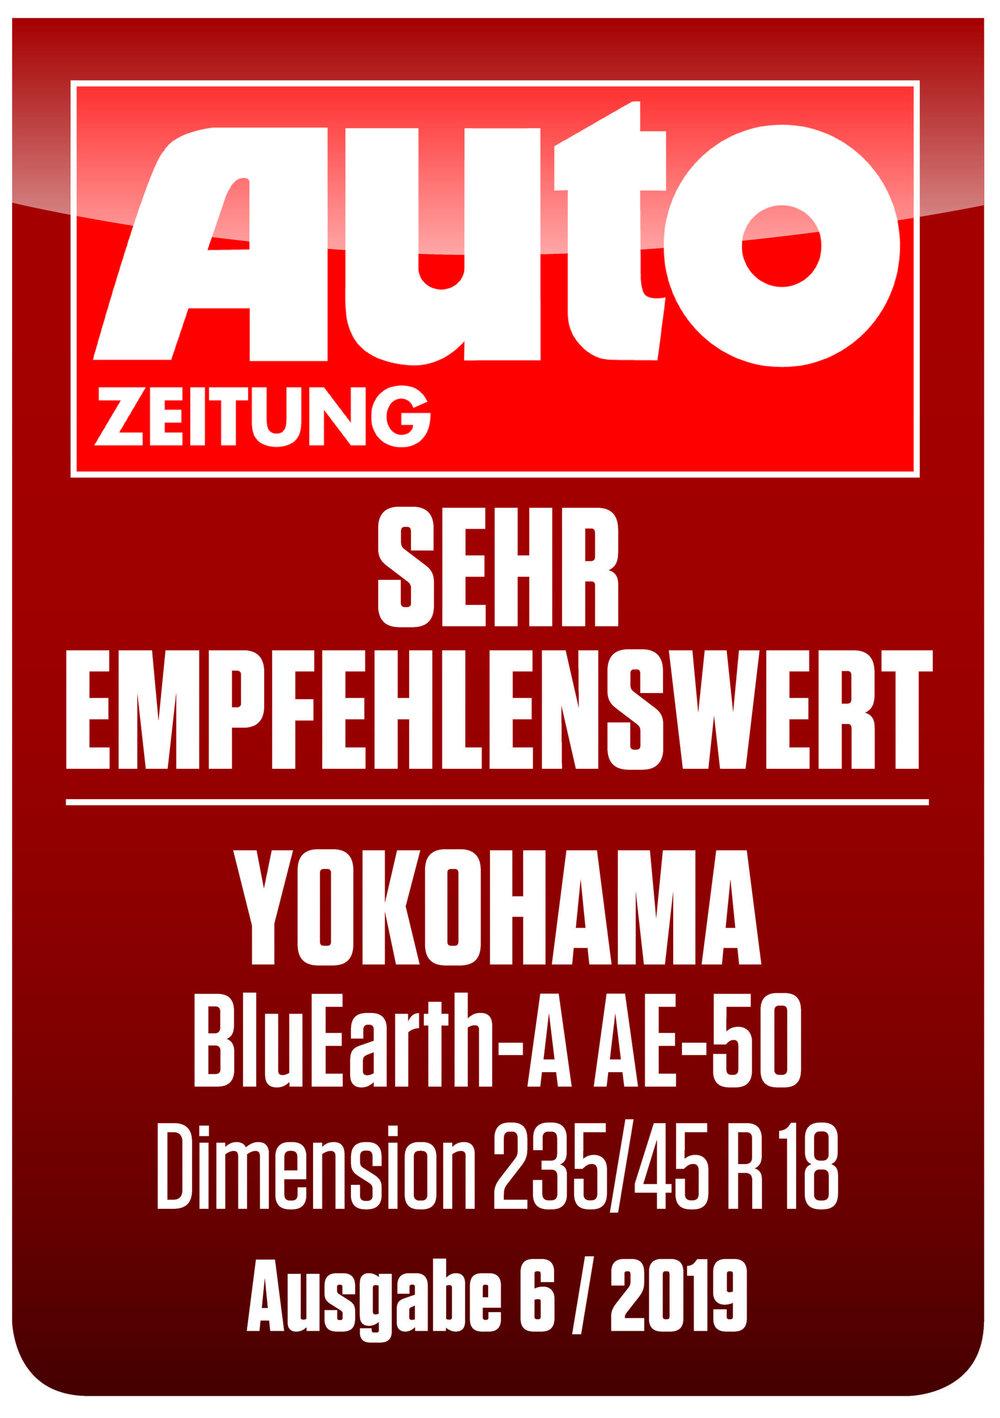 AUTOZEITUNG+YOKOHAMA+BluEarth+sehr+empfehlenswert